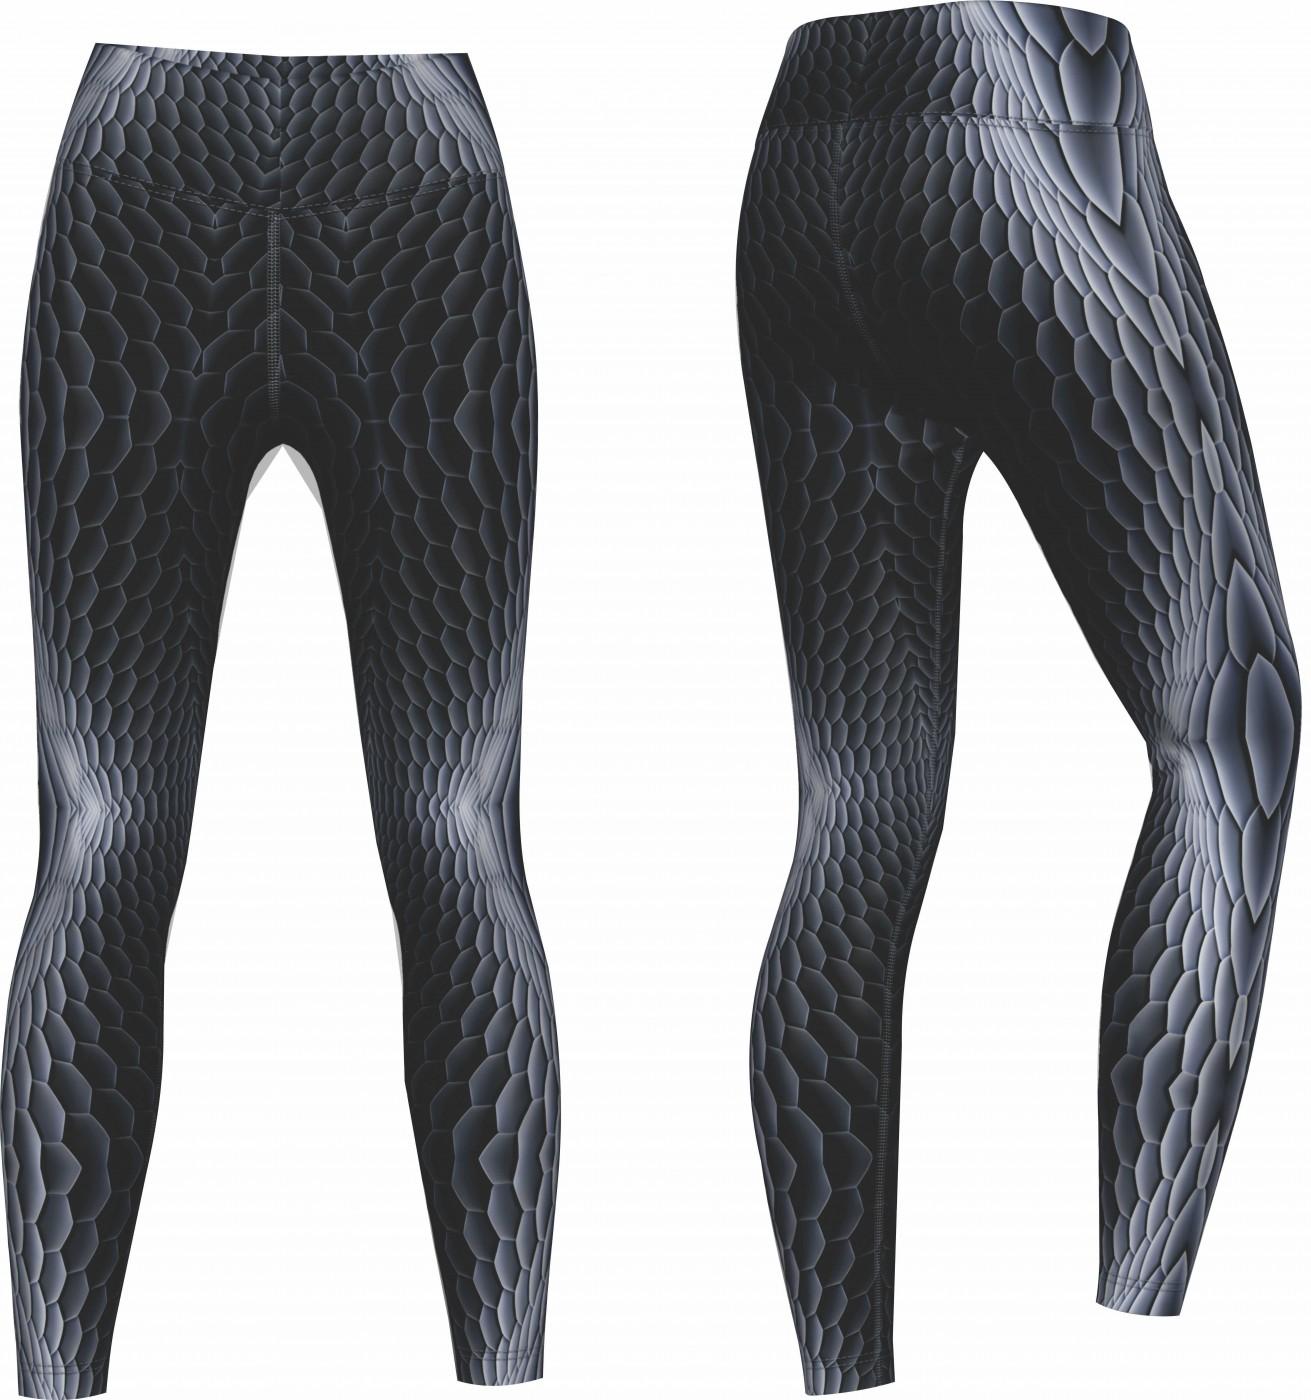 viper leggings sehr dehnbar f r sport gymnastik training fashion grau. Black Bedroom Furniture Sets. Home Design Ideas